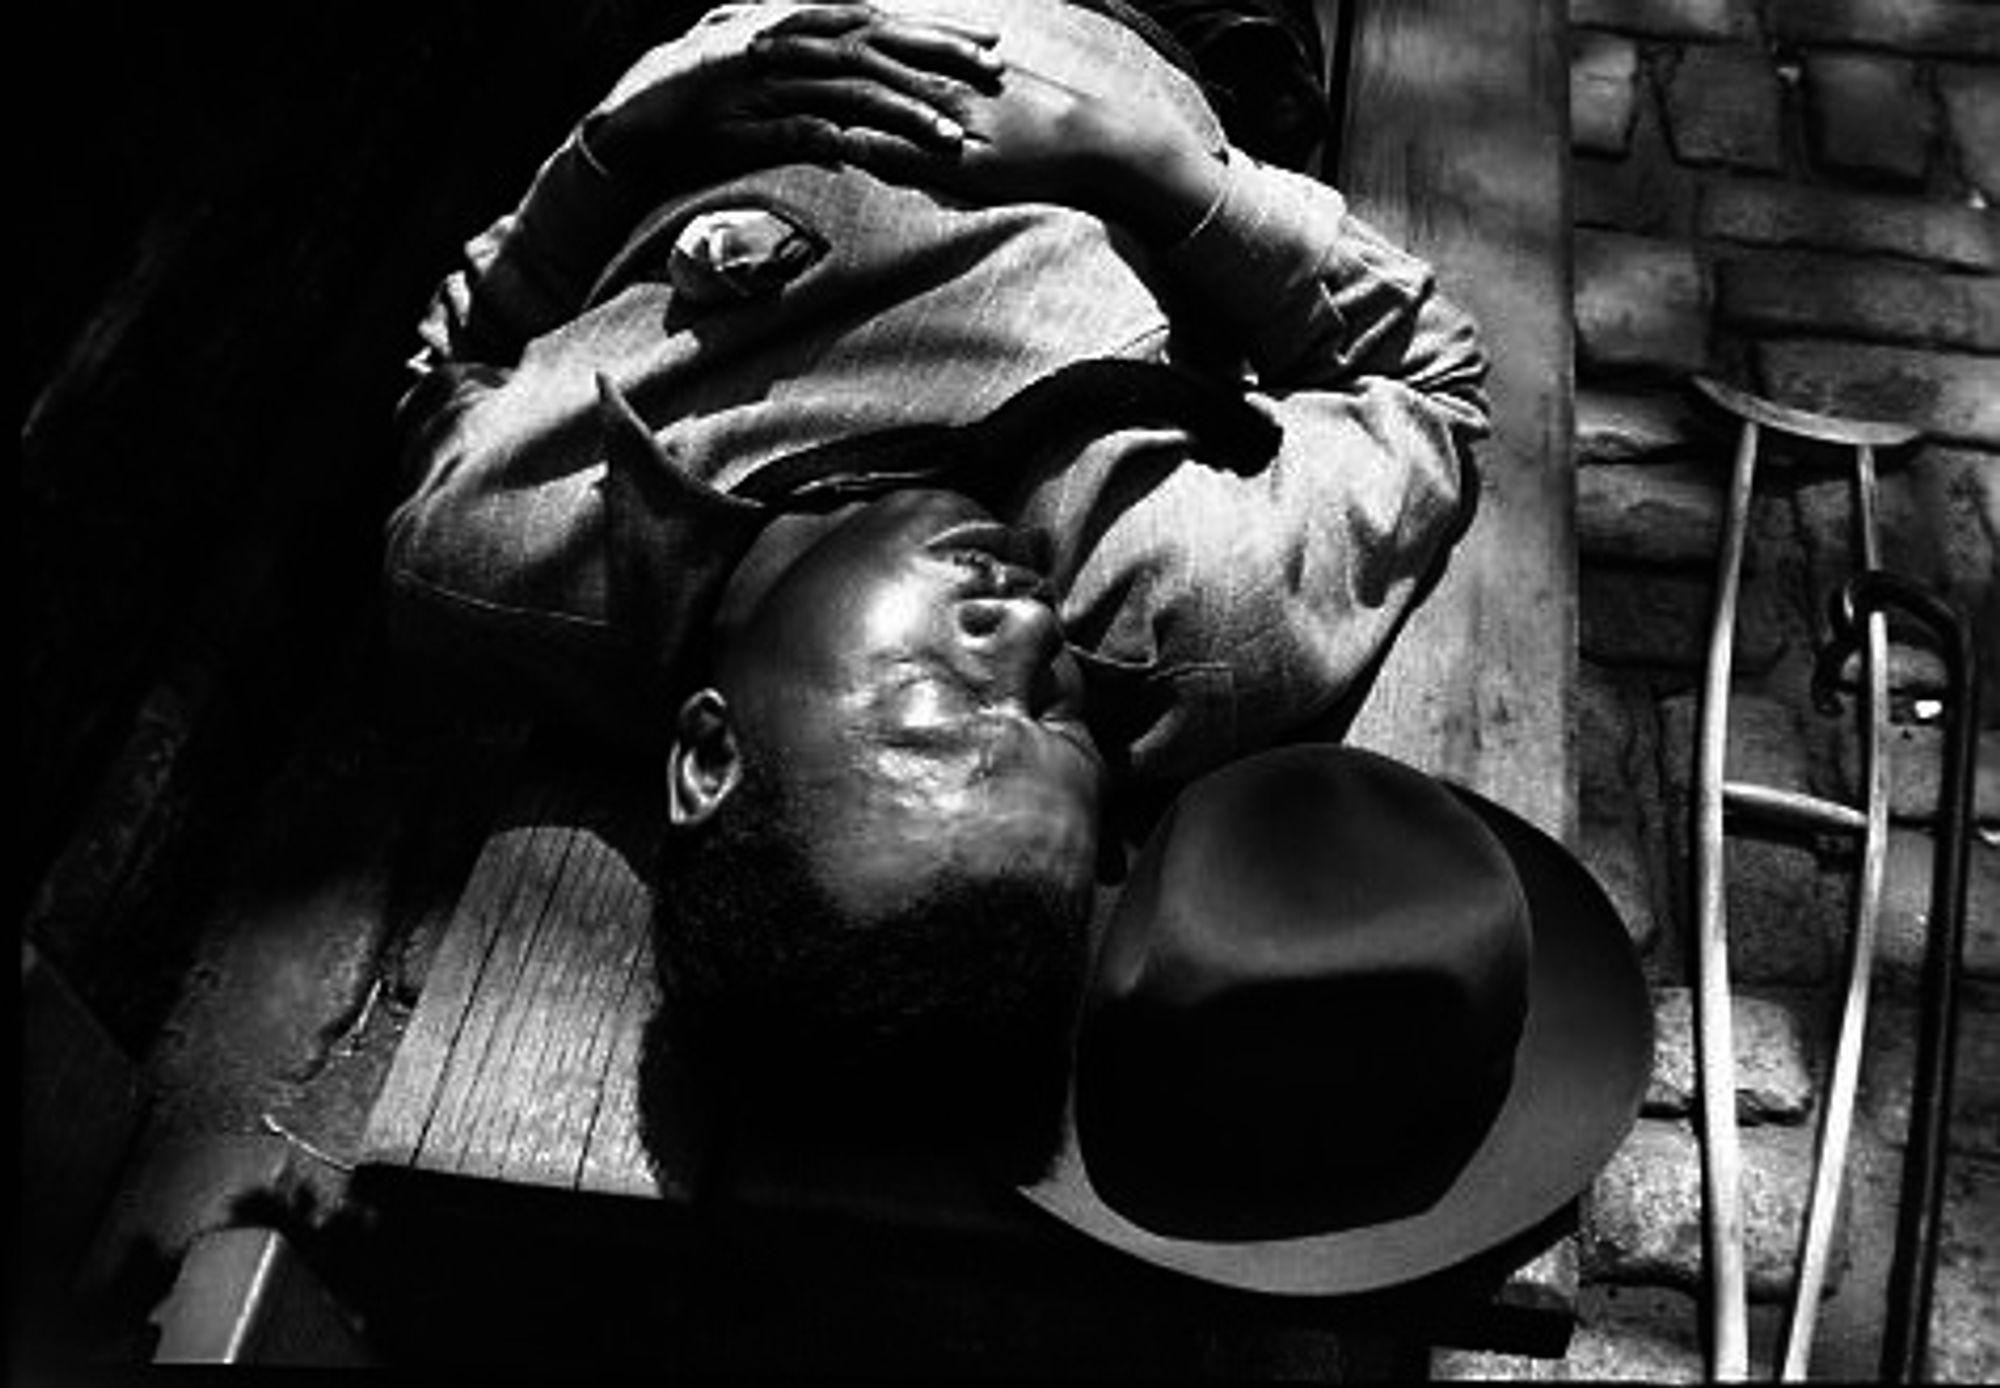 Mann på benk. Foto: Vivian Maier.